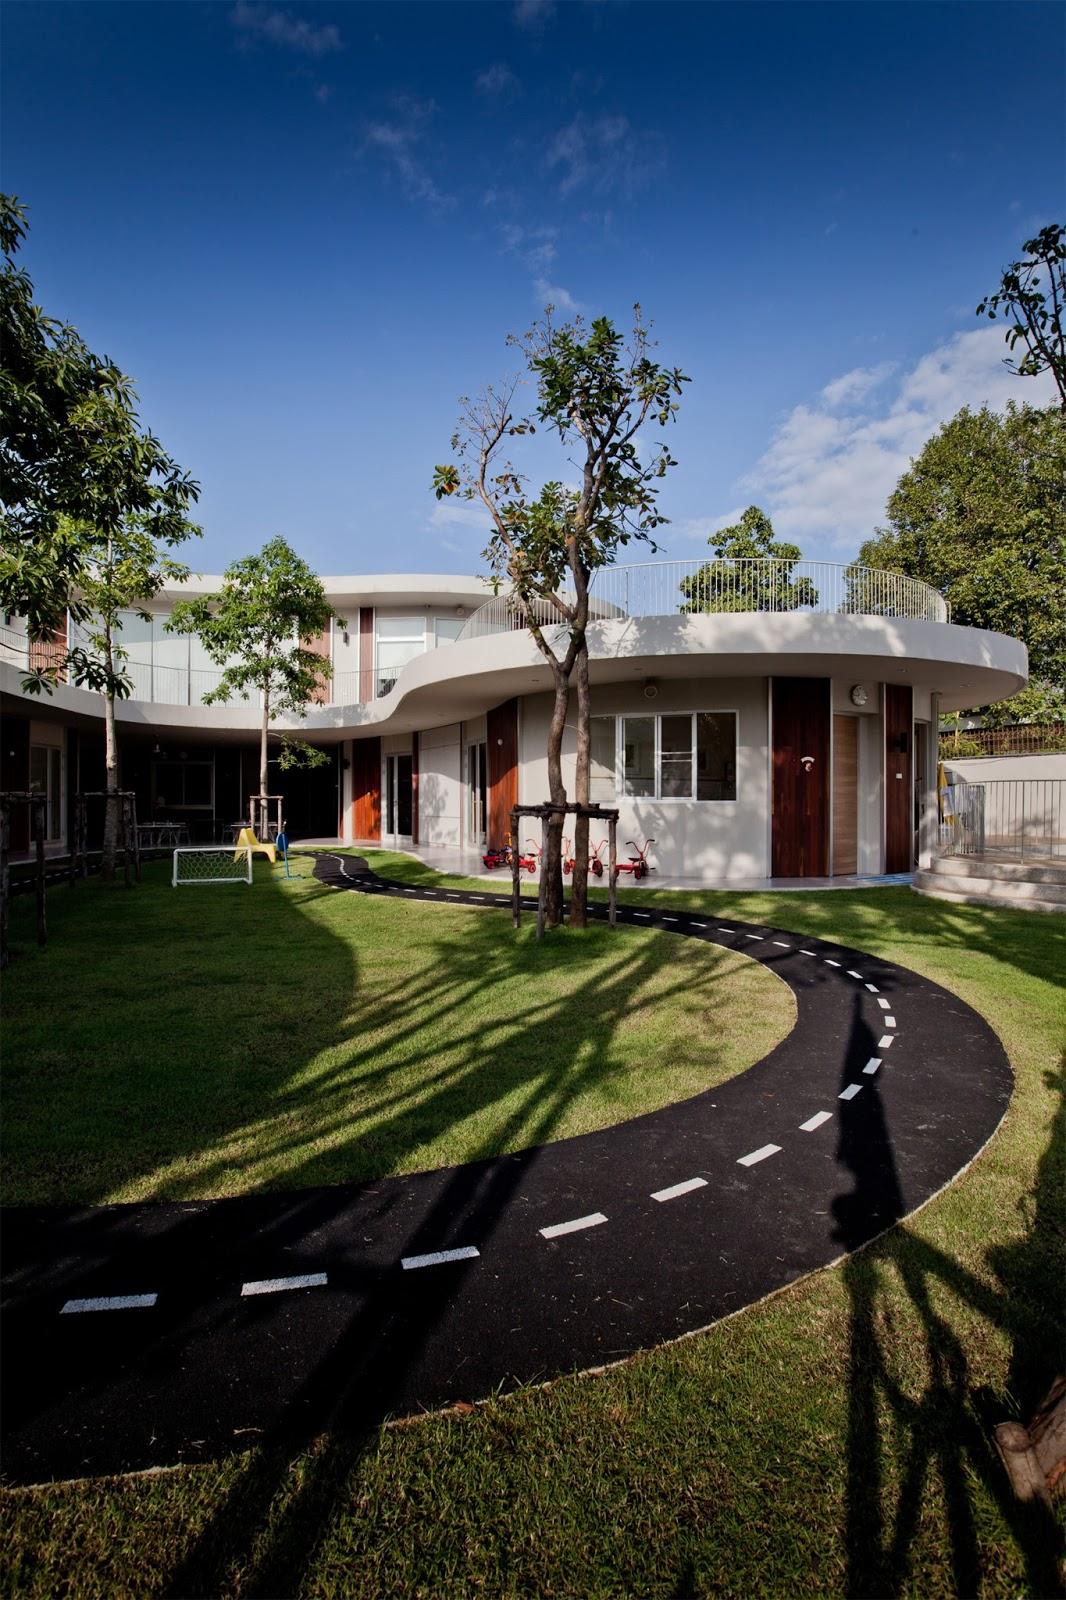 kensington preschool looking for ideas for your home โรงเร ยนอน บาลนานาชาต เคน 495